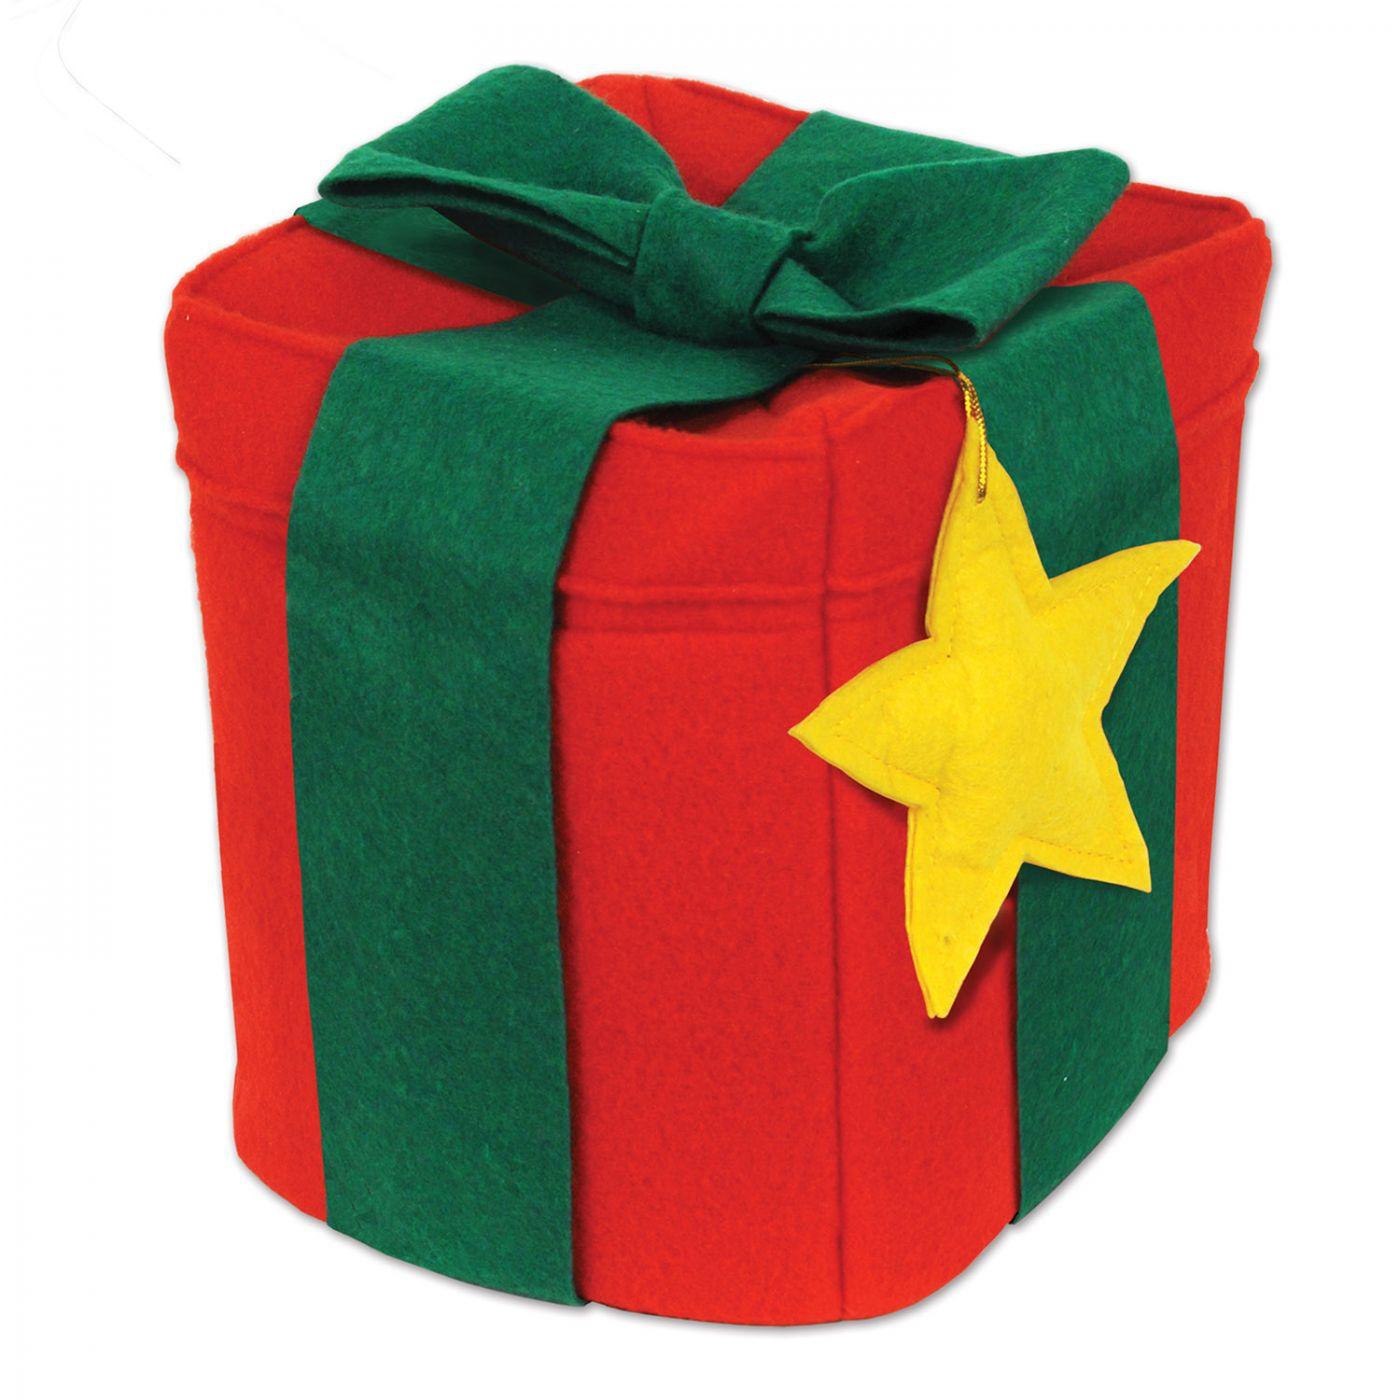 Felt Christmas Gift Hat (6) image